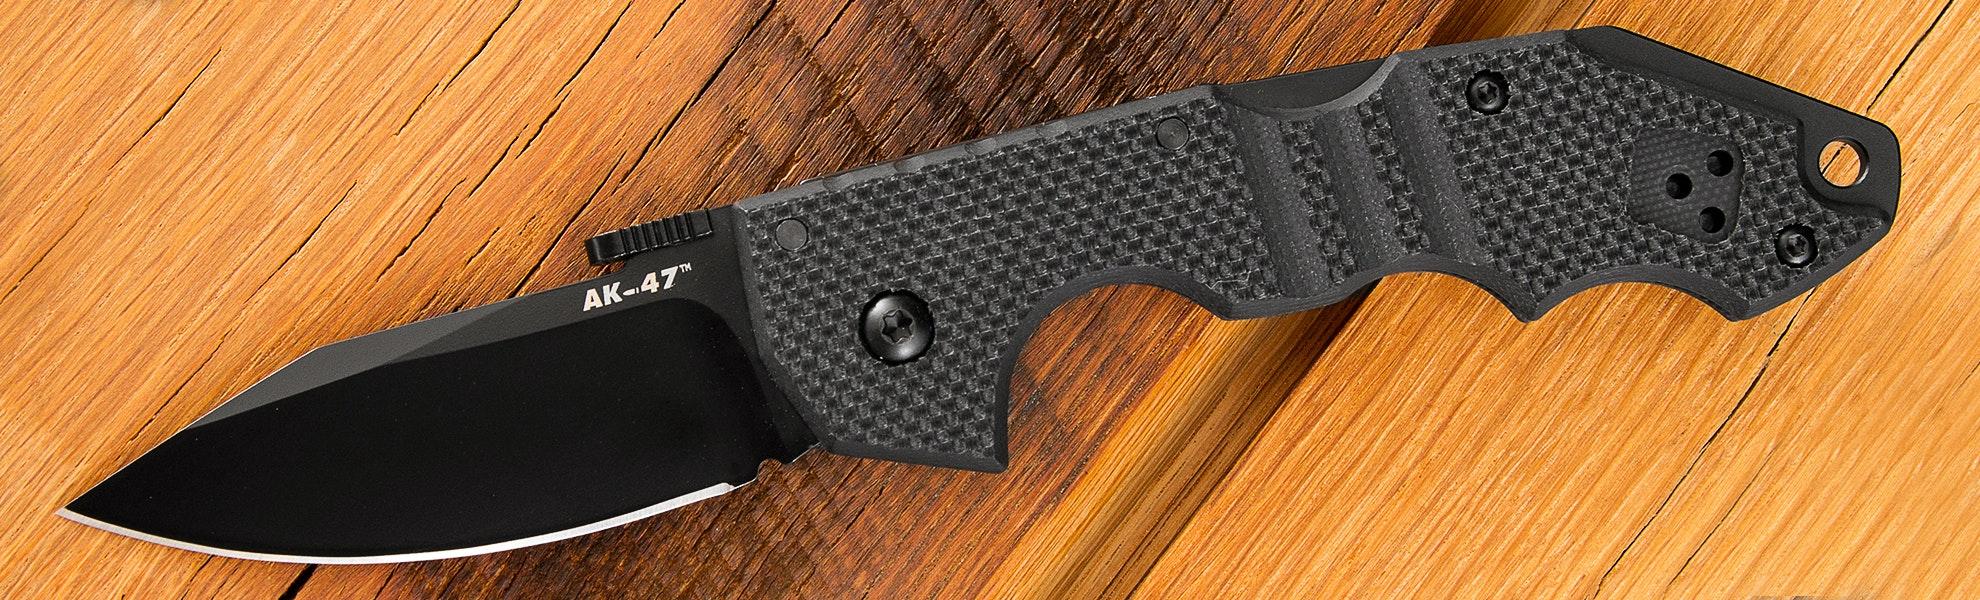 Cold Steel AK-47 Series Folding Knife